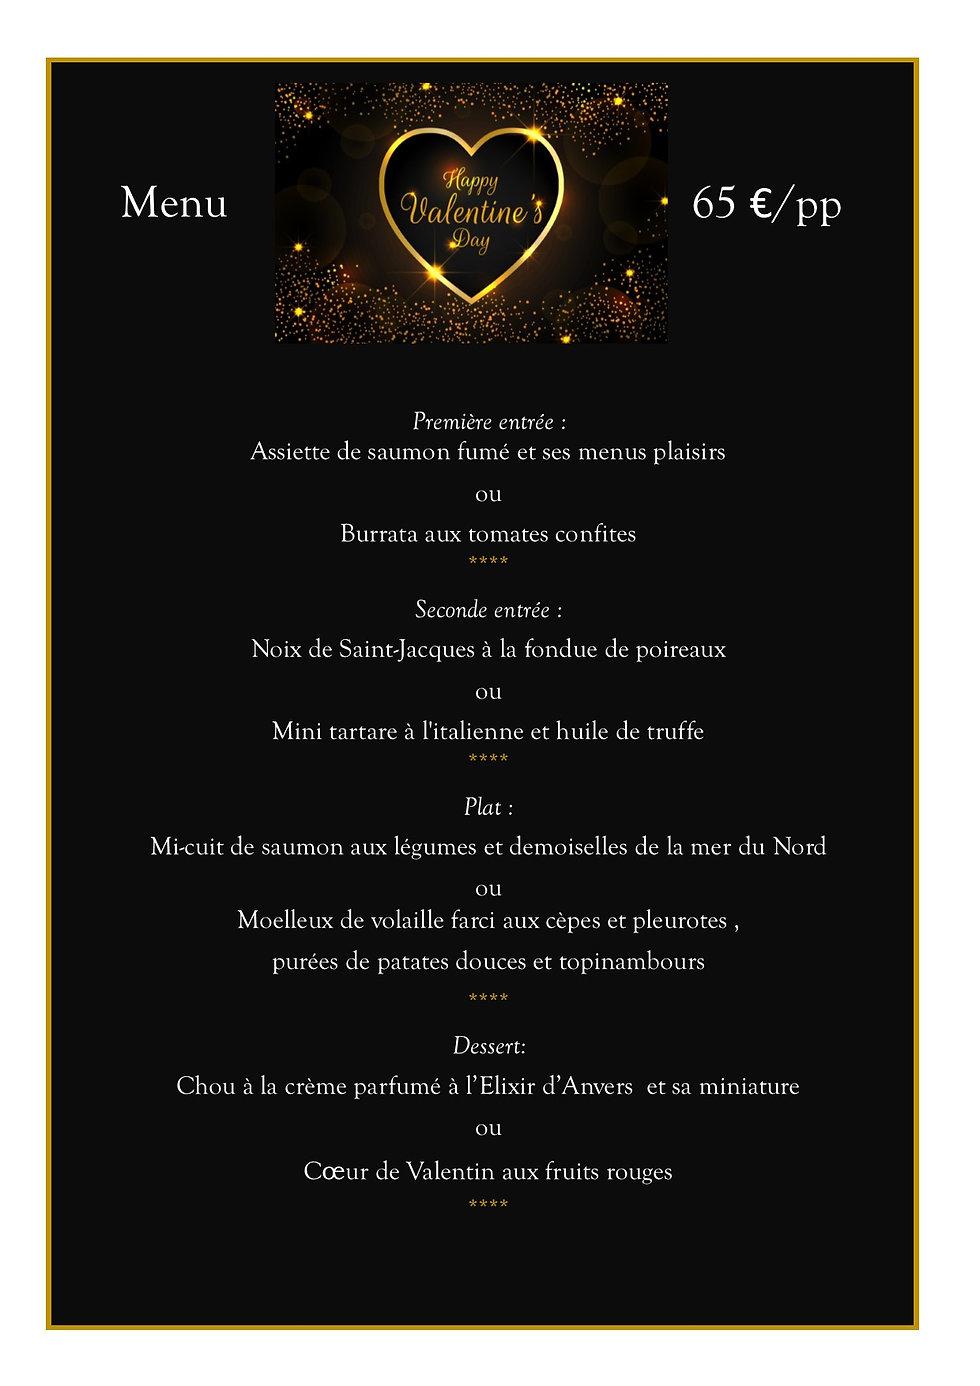 2021_02_14_ValentinesDay-65EUR.pub.jpg